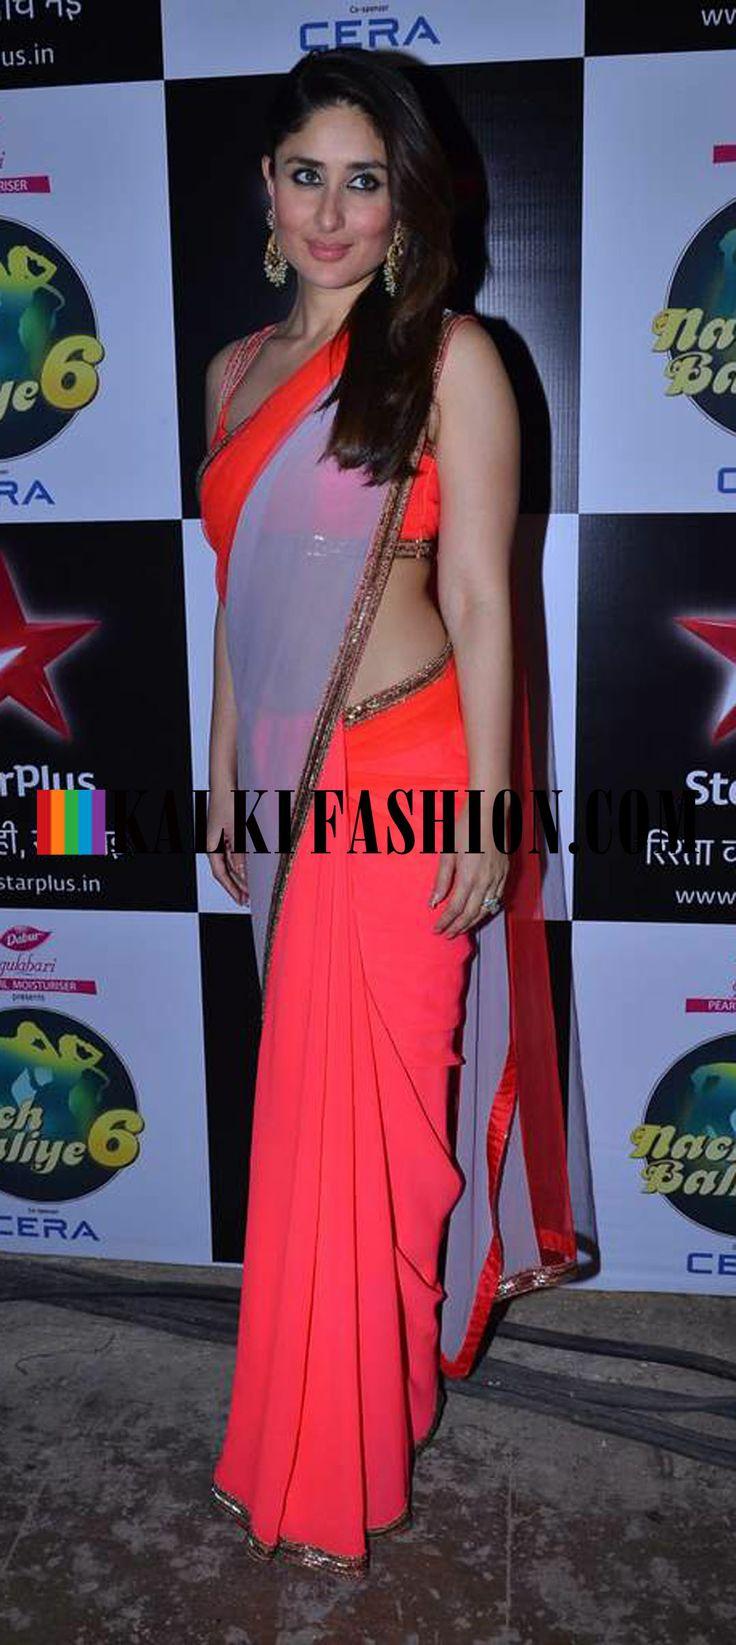 Kareena Kapoor Khan - two tone Manish Malhotra sari